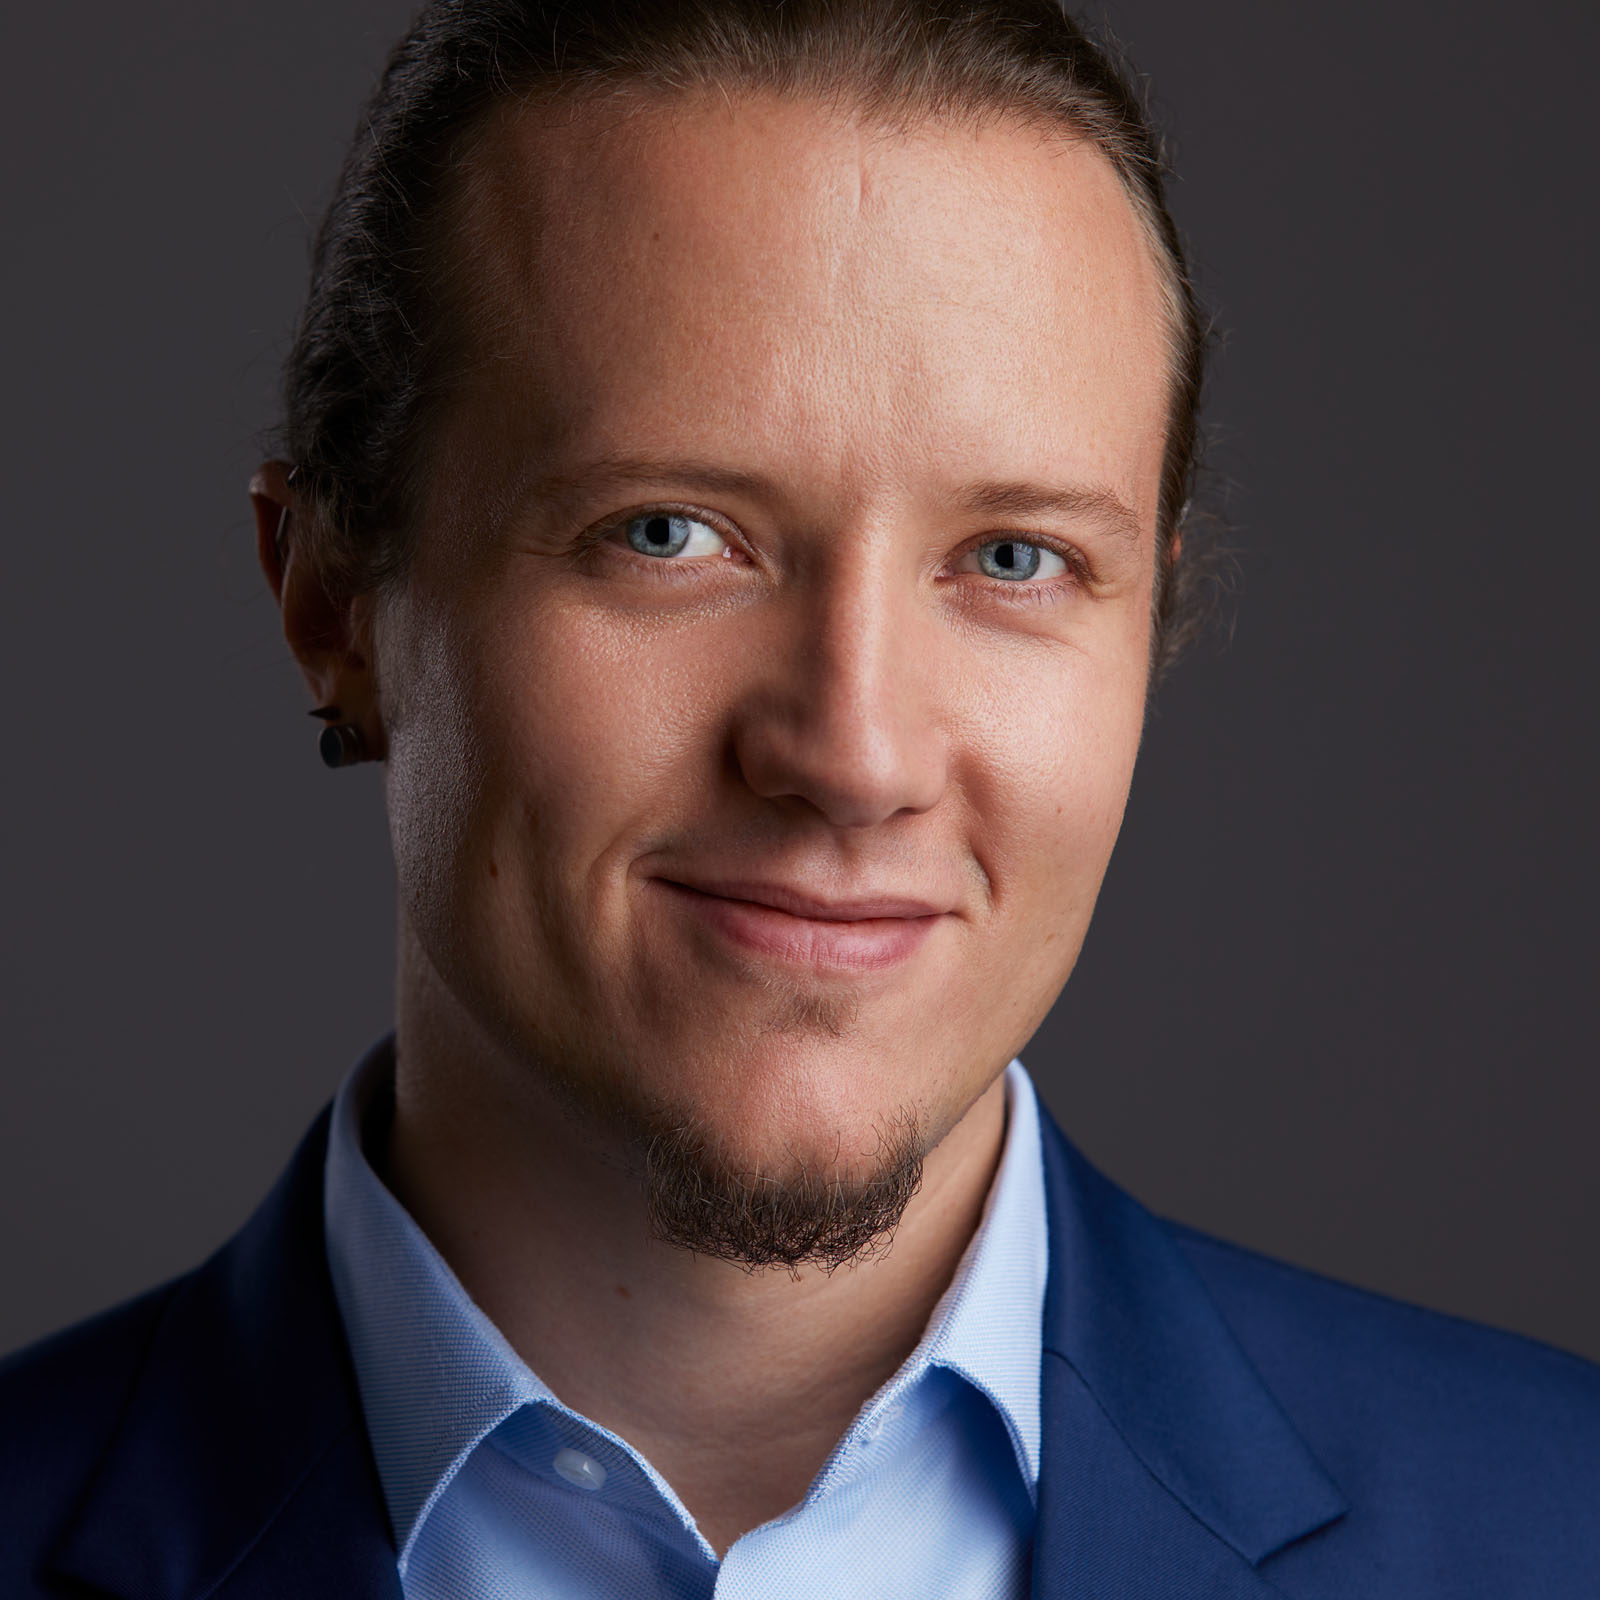 Thomas Urbanek